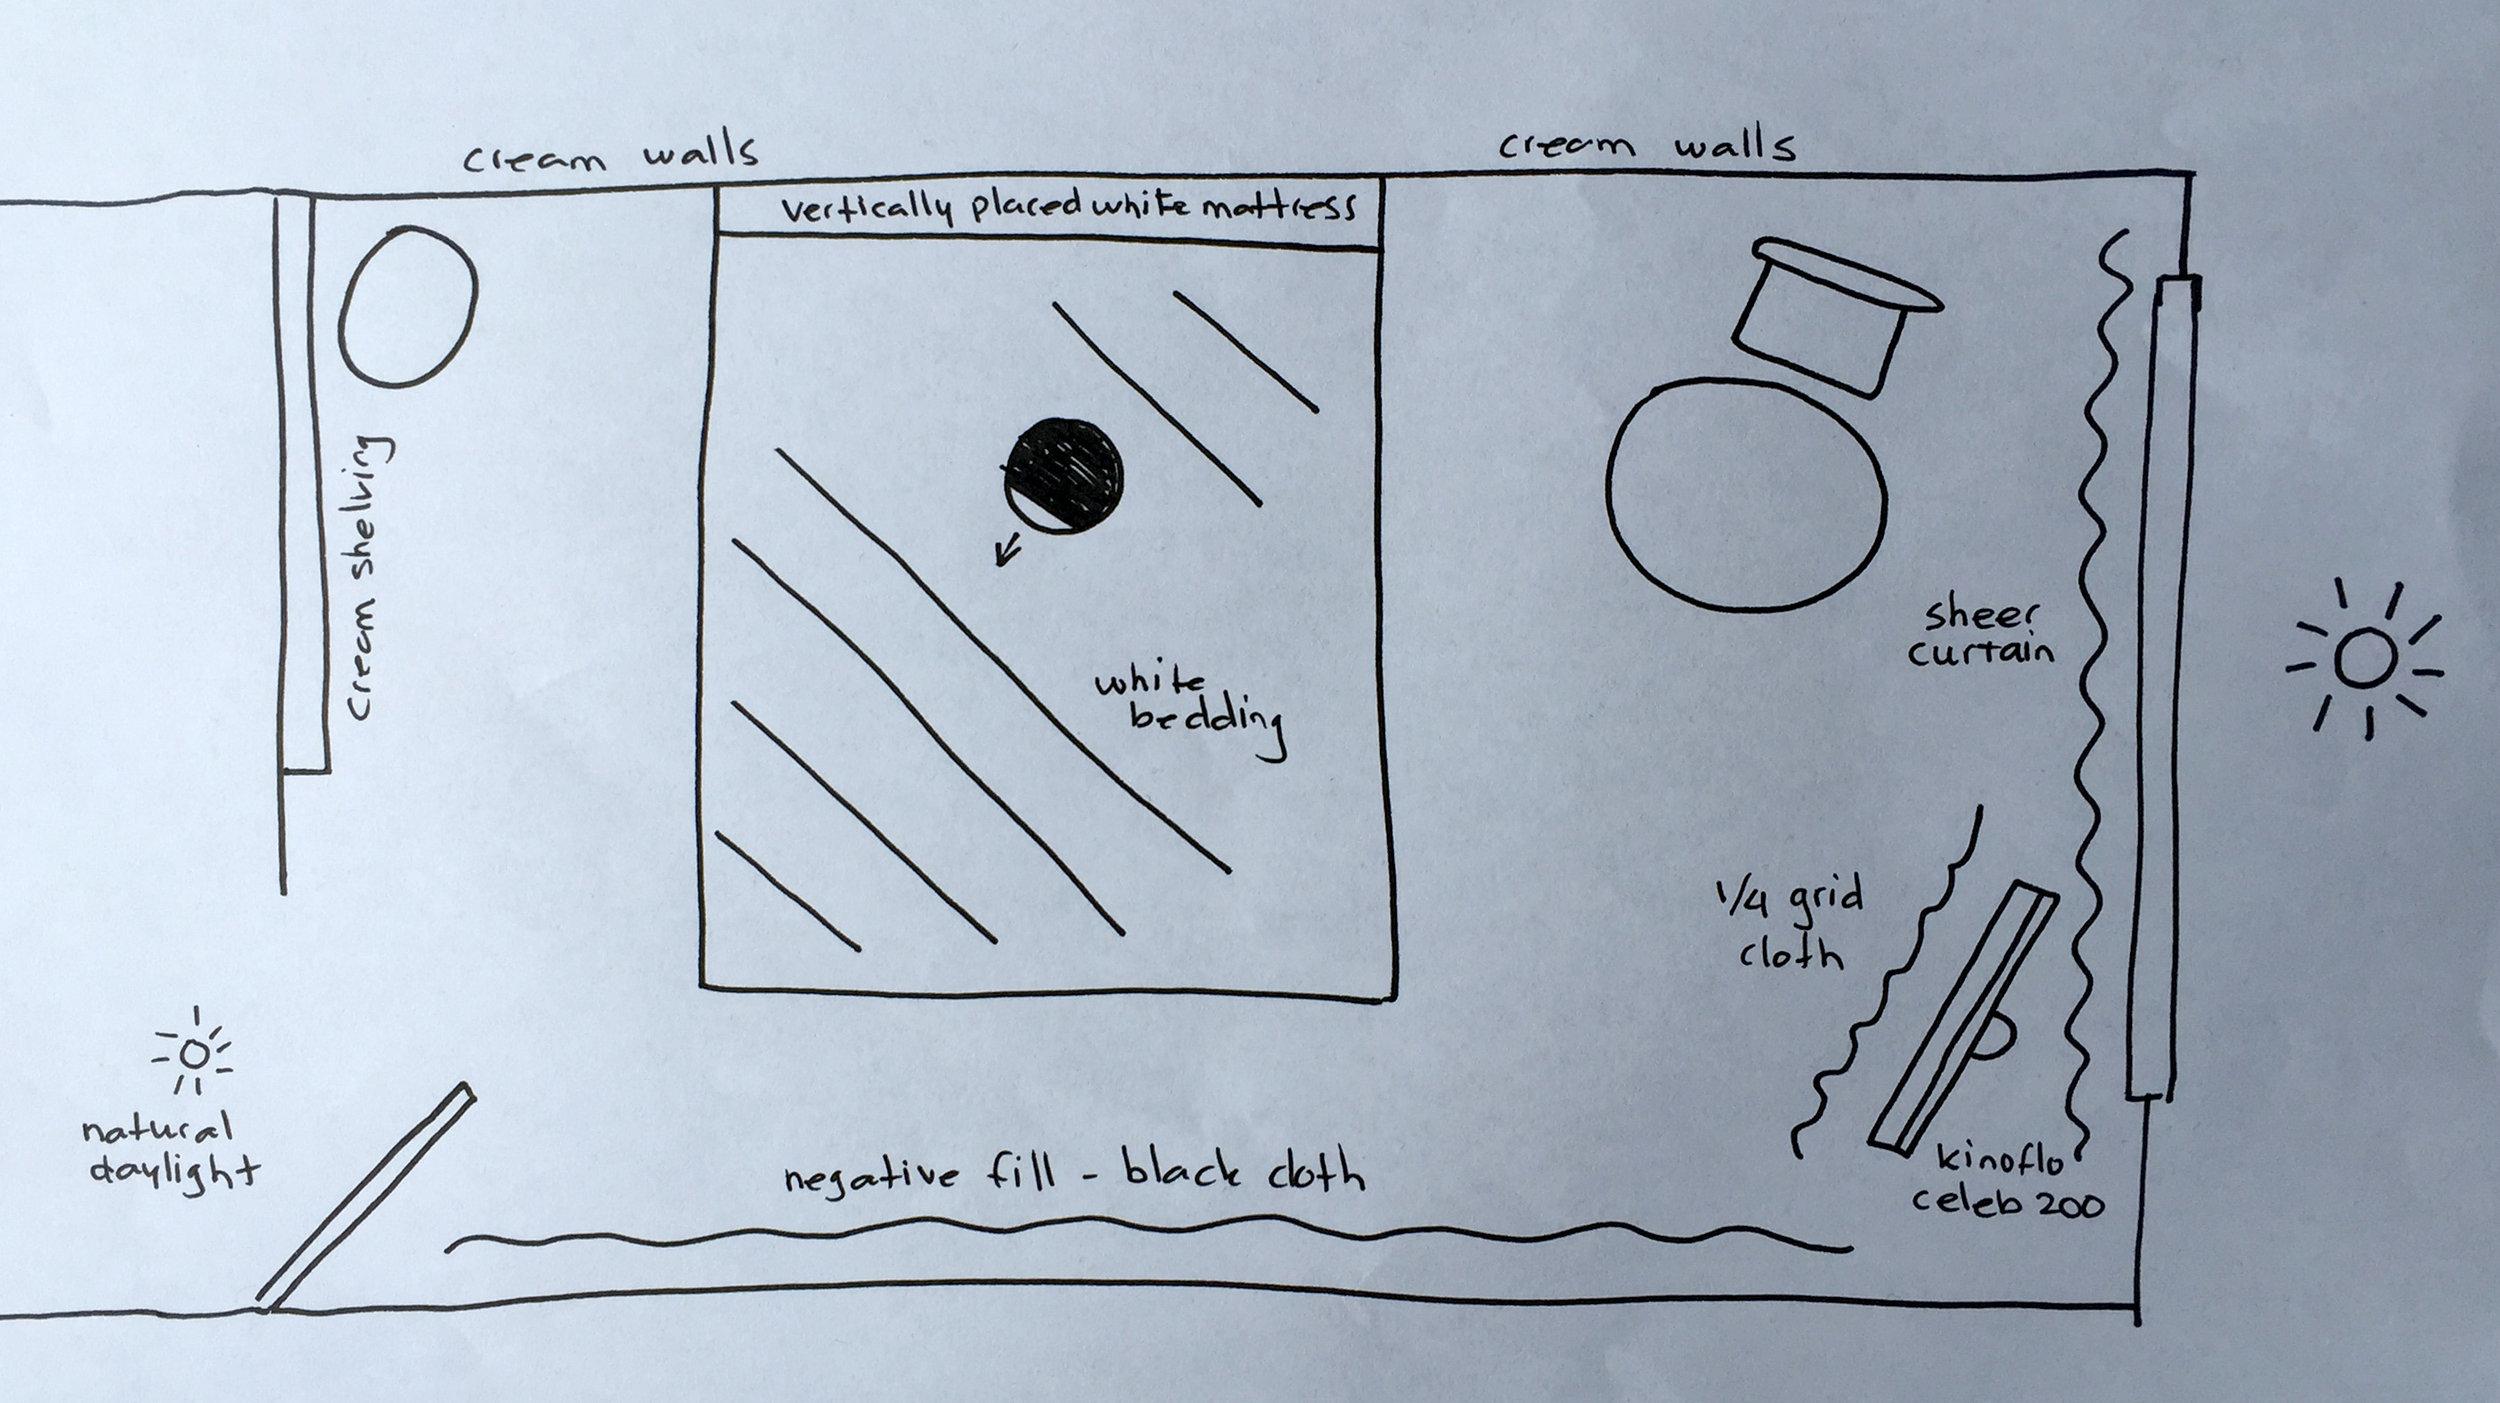 My original lighting diagram.